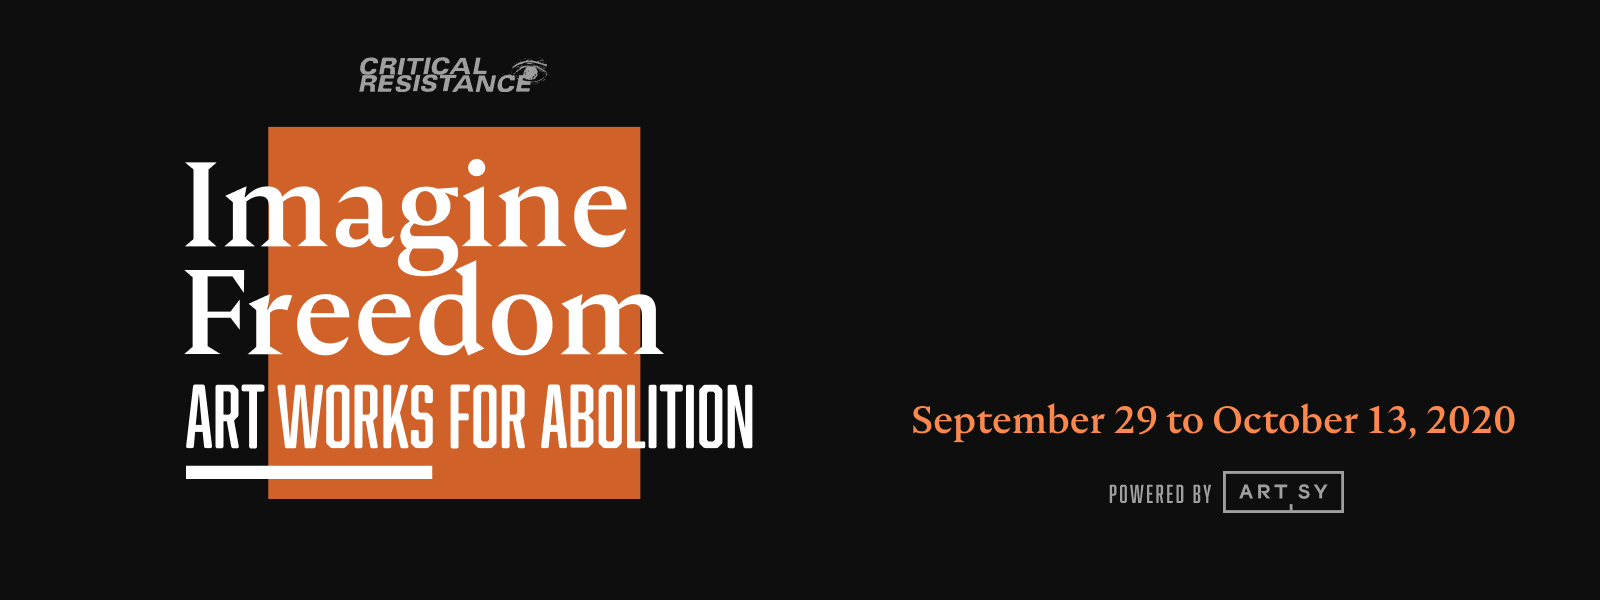 Imagine Freedom: Art Works for Abolition image